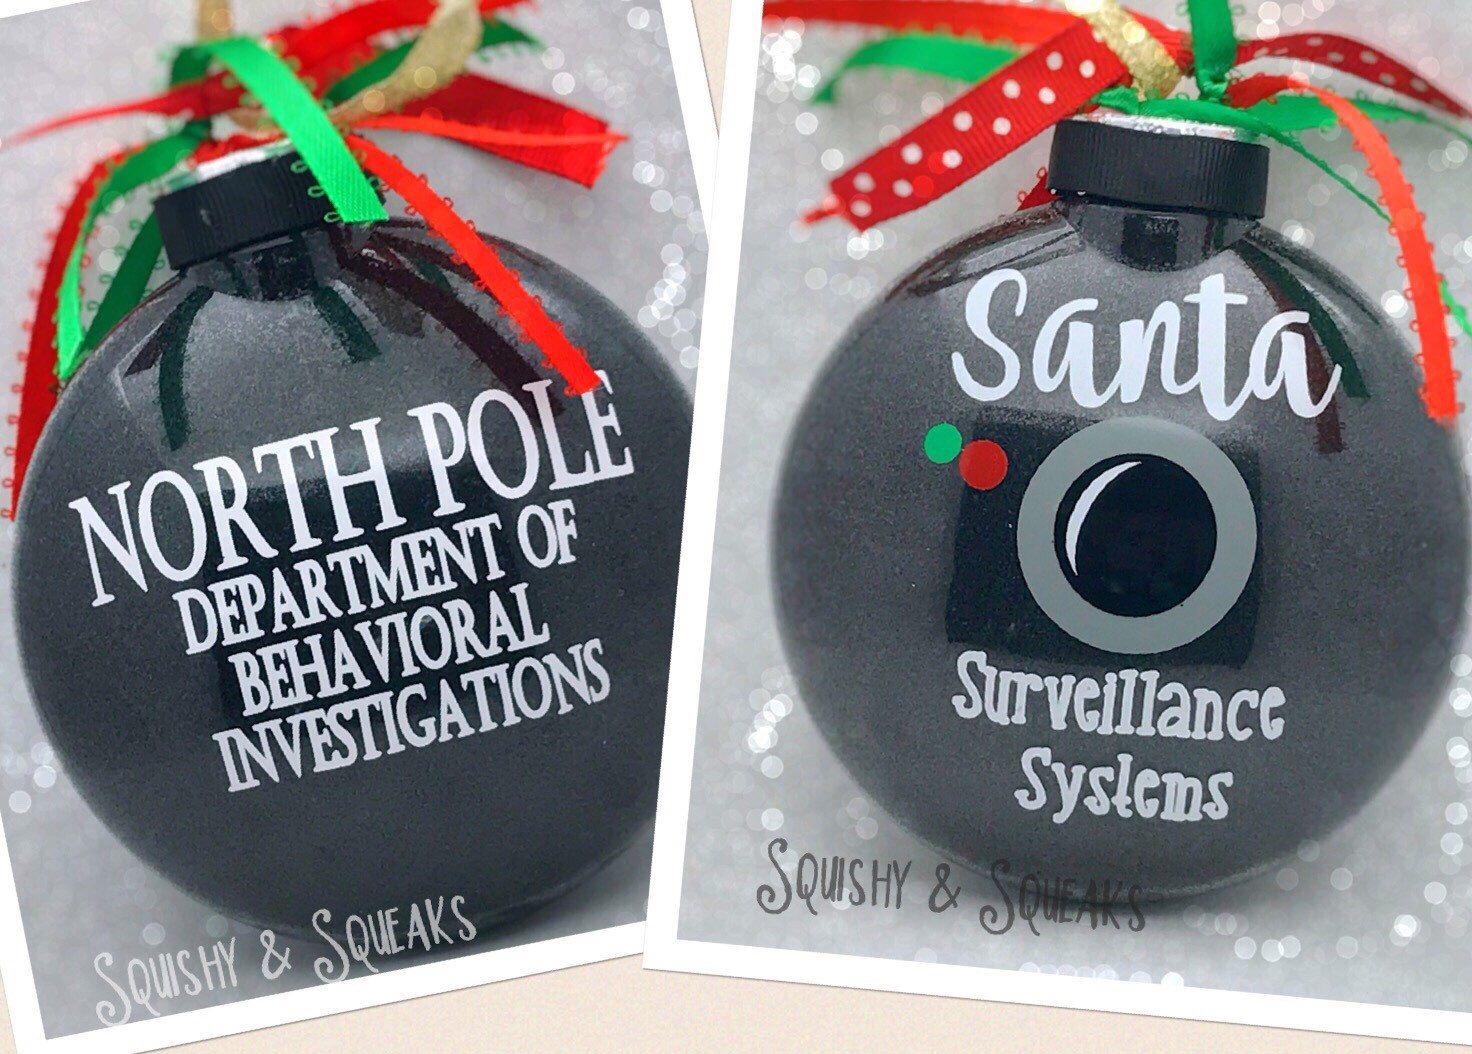 Ornaments with names on them - Santa Cam Large Santa Camera Santa Ornament Glitter Christmas Ornament Santa Surveillance North Pole Viewer